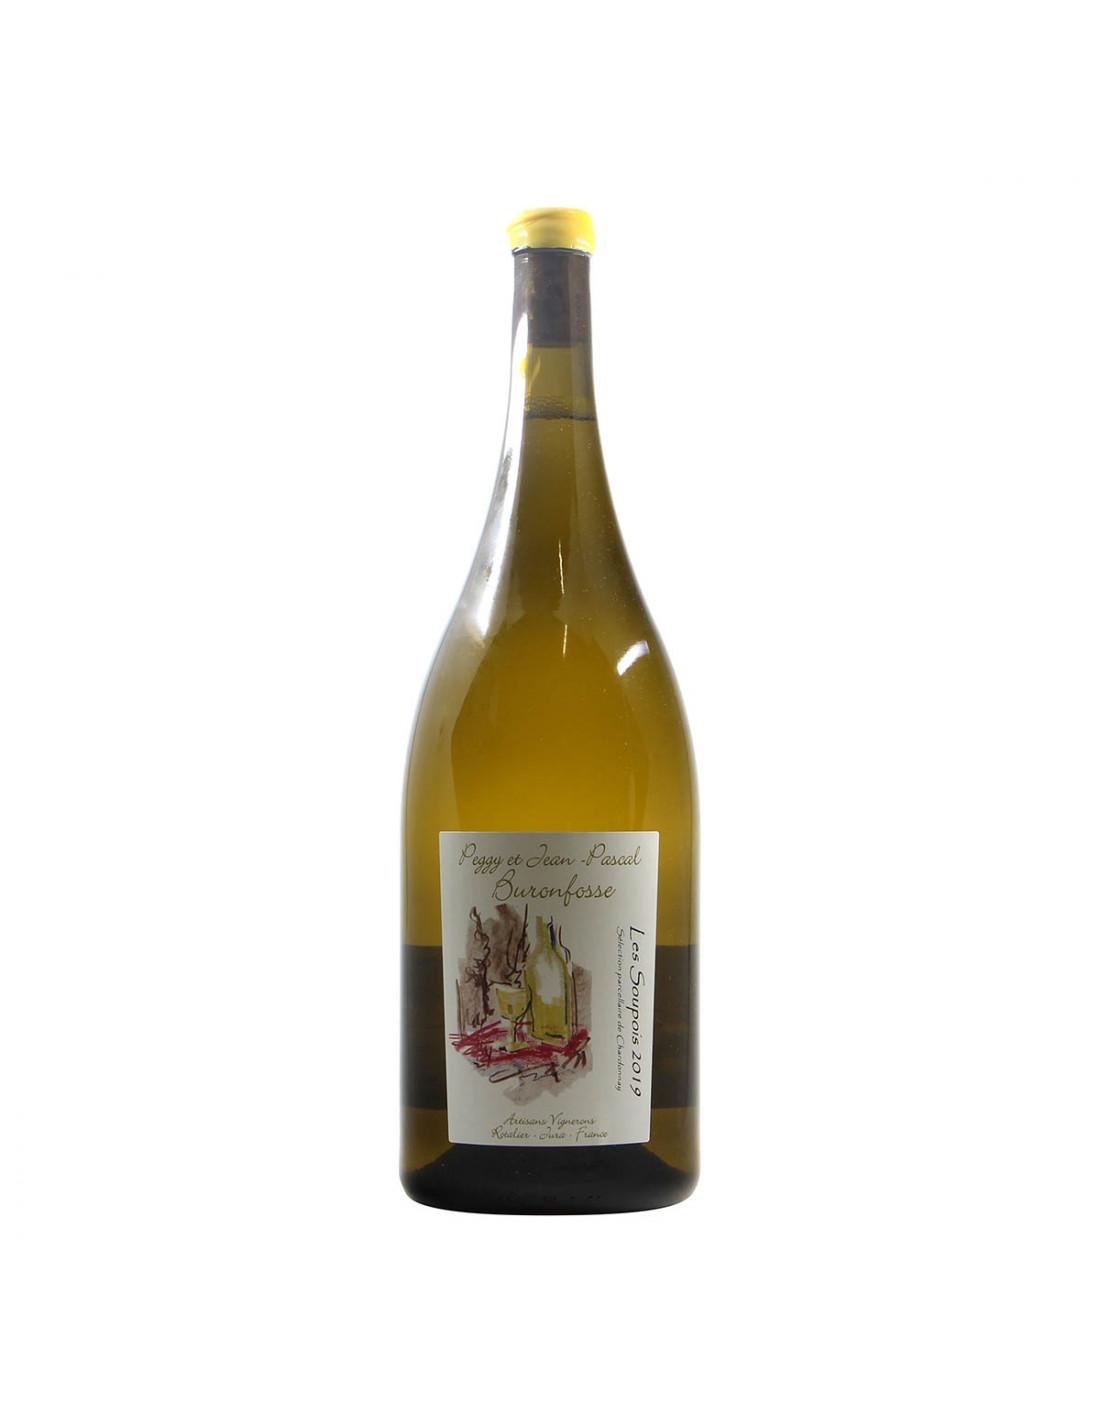 Domaine Buronfosse Les Soupois Chardonnay Magnum 2019 Grandi Bottiglie